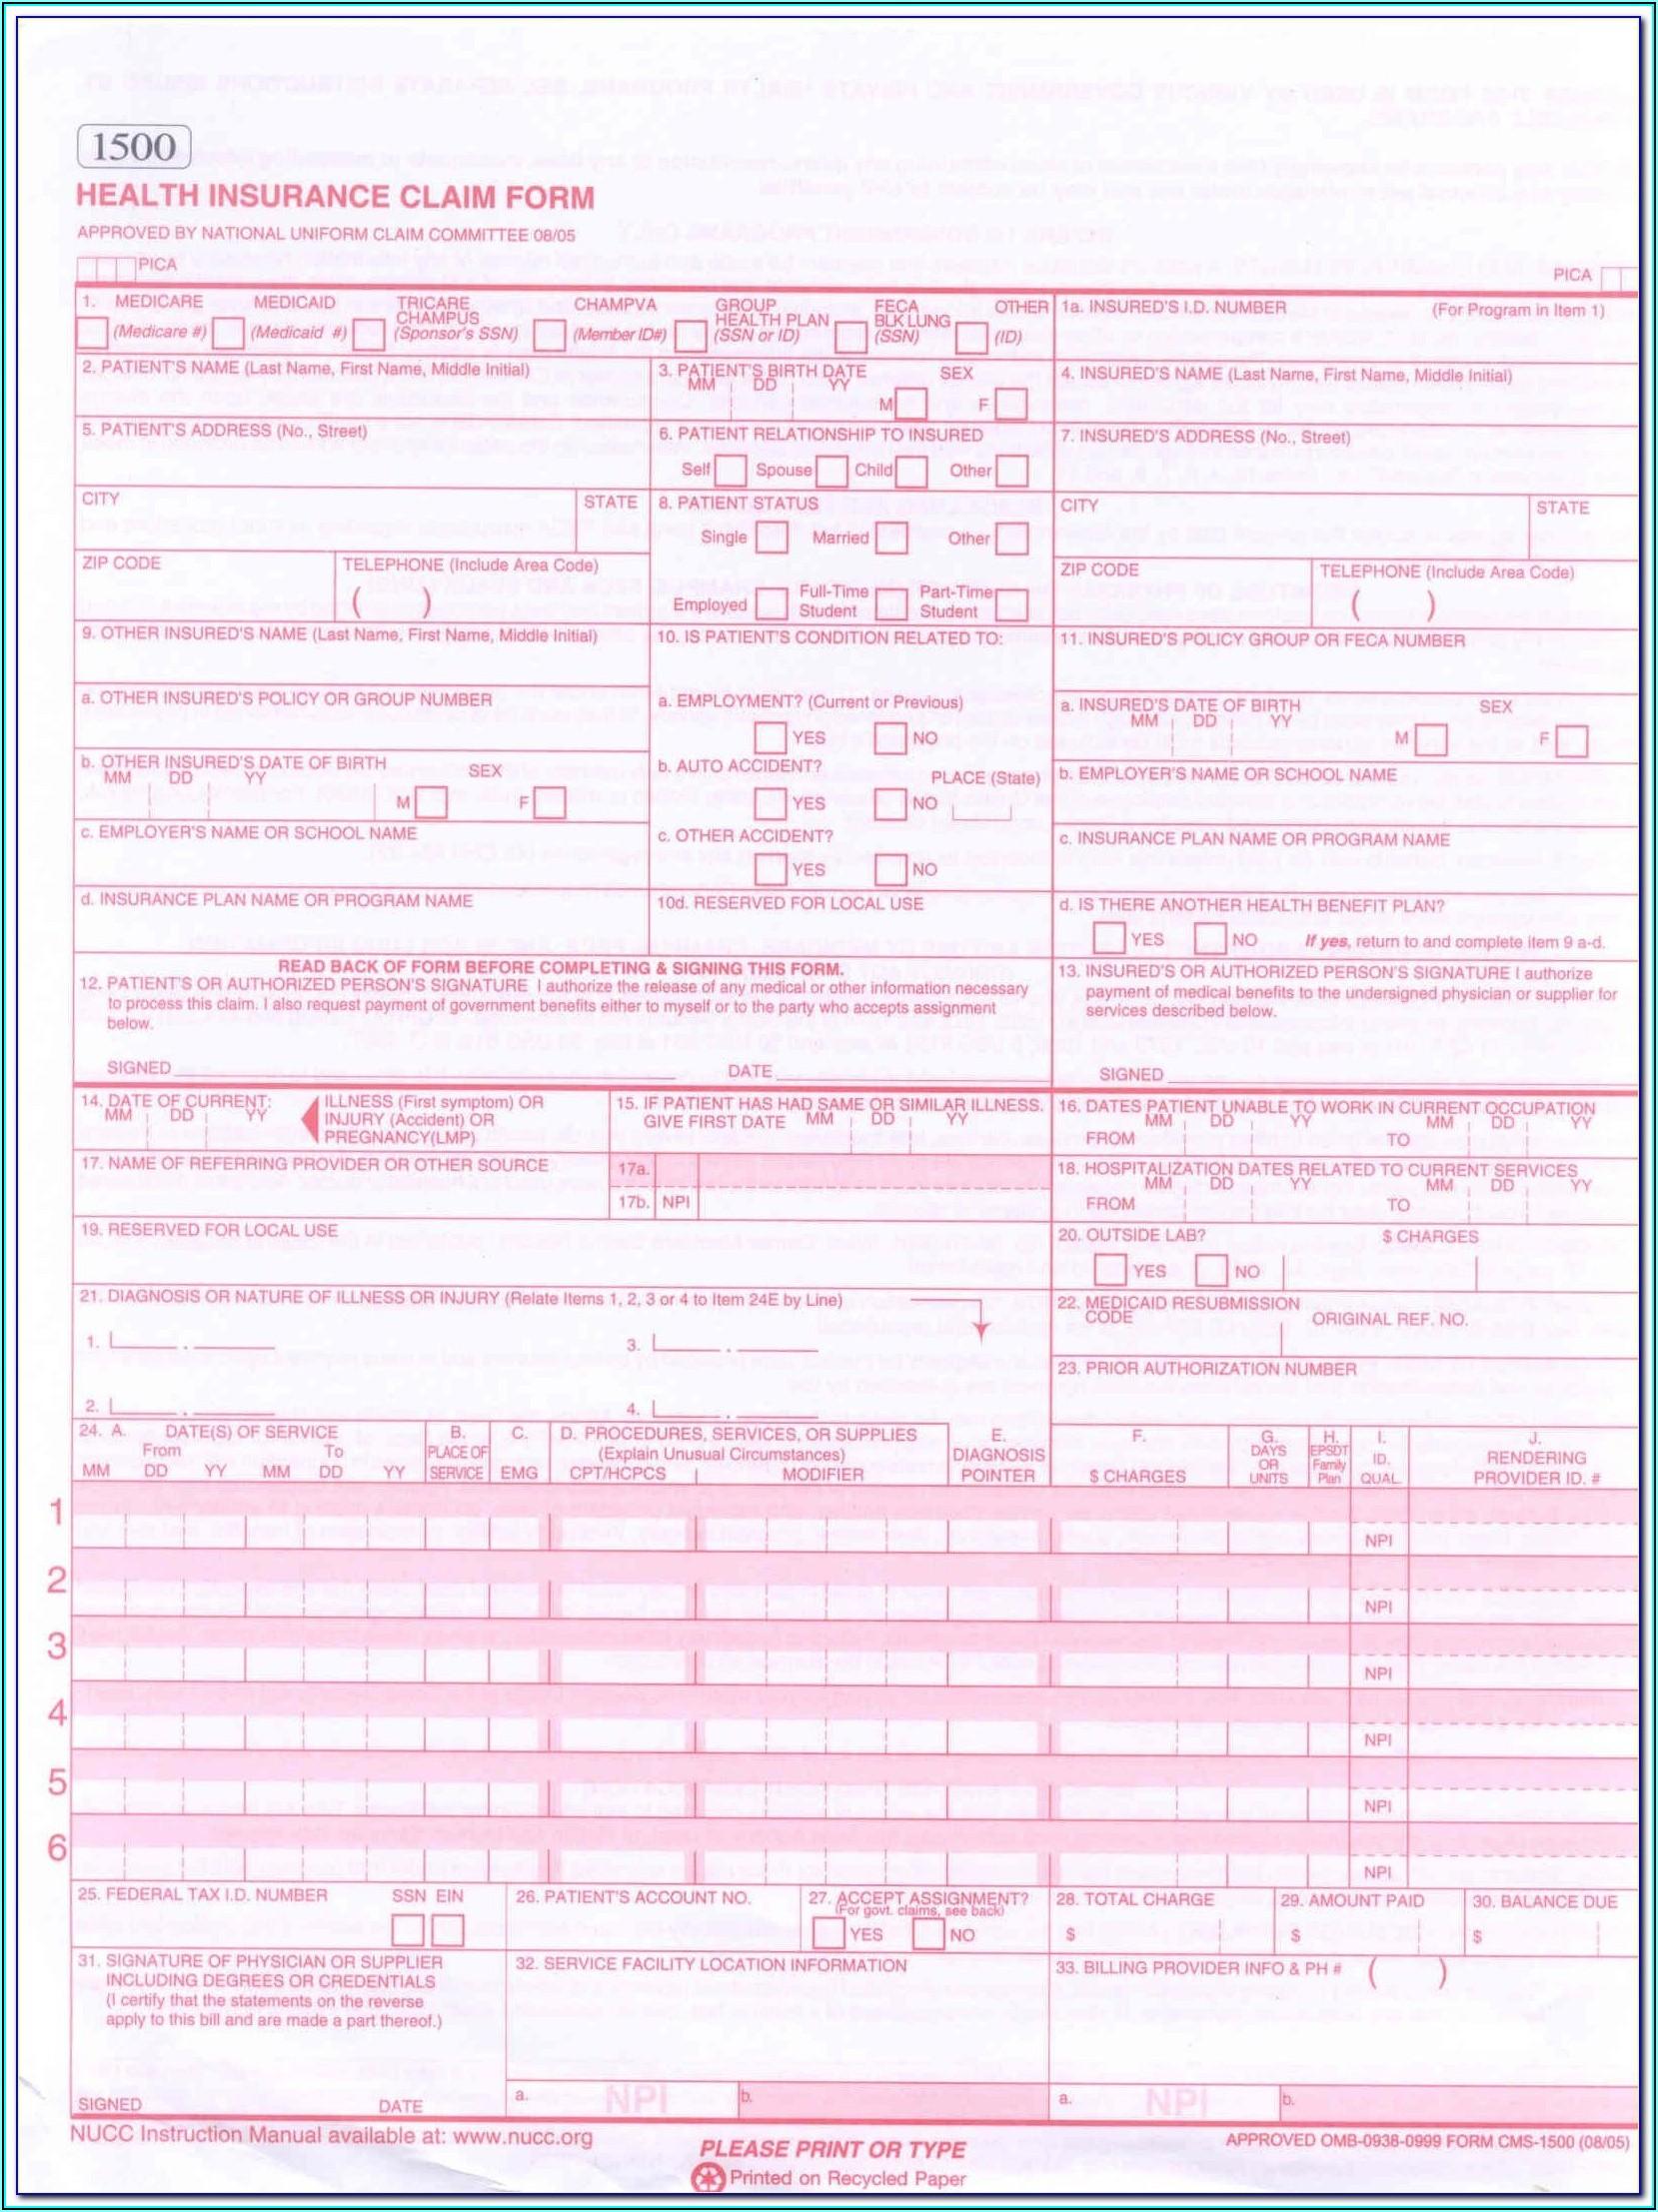 Sample Cms 1500 Claim Form Medicare